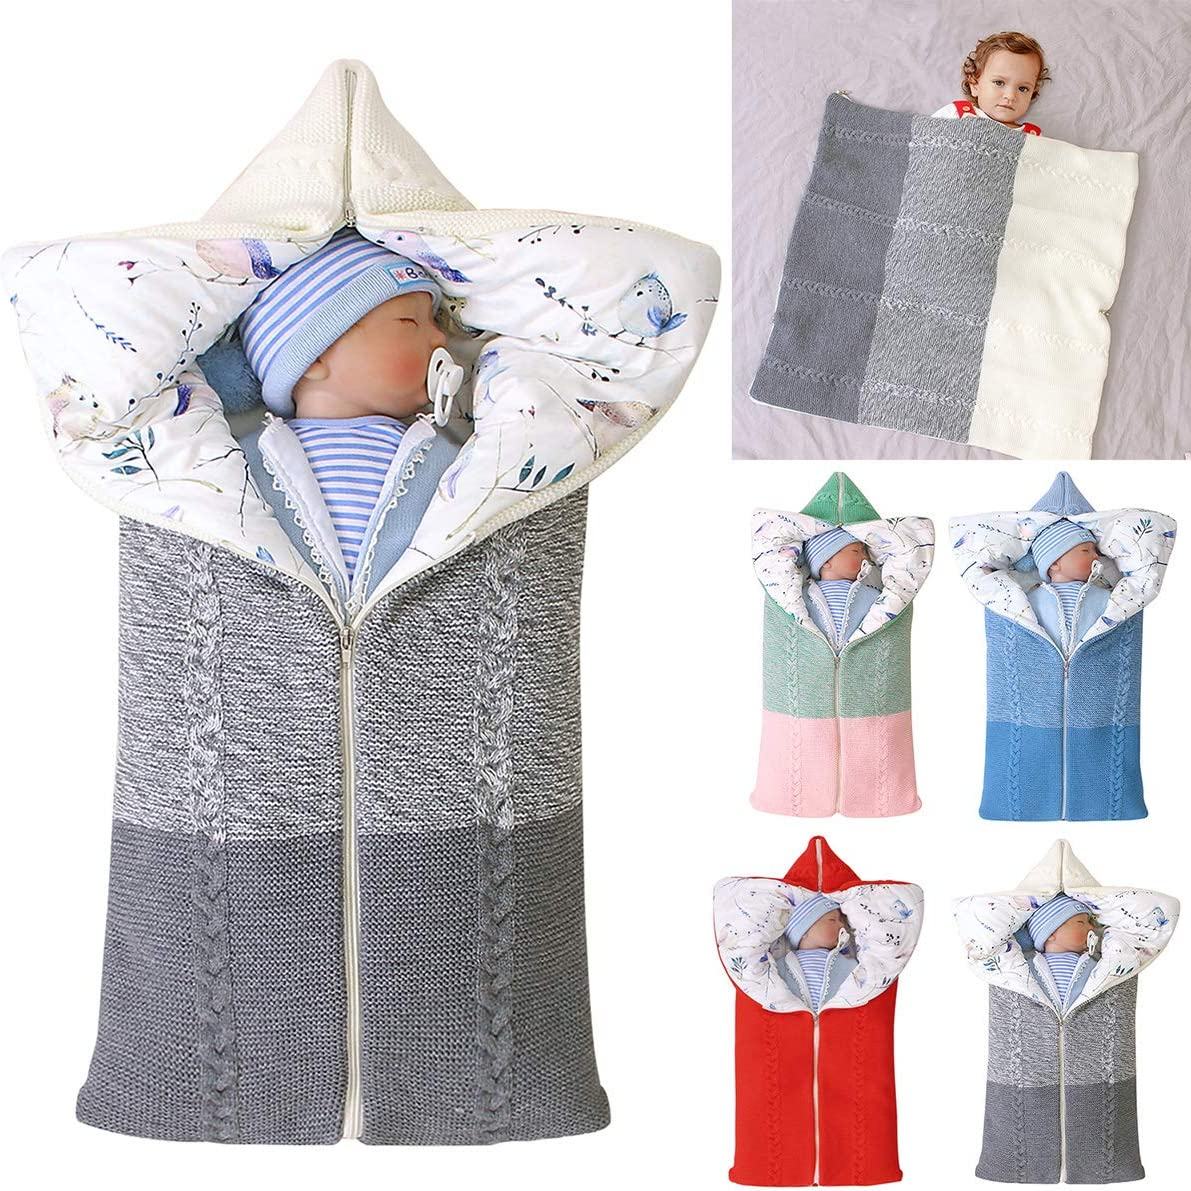 Baby Swaddle Blanket Stroller Wrap,Soft Thick Fleece Warm Blanket Newborn Sleeping Bag for 0-12 Month Boys Girls